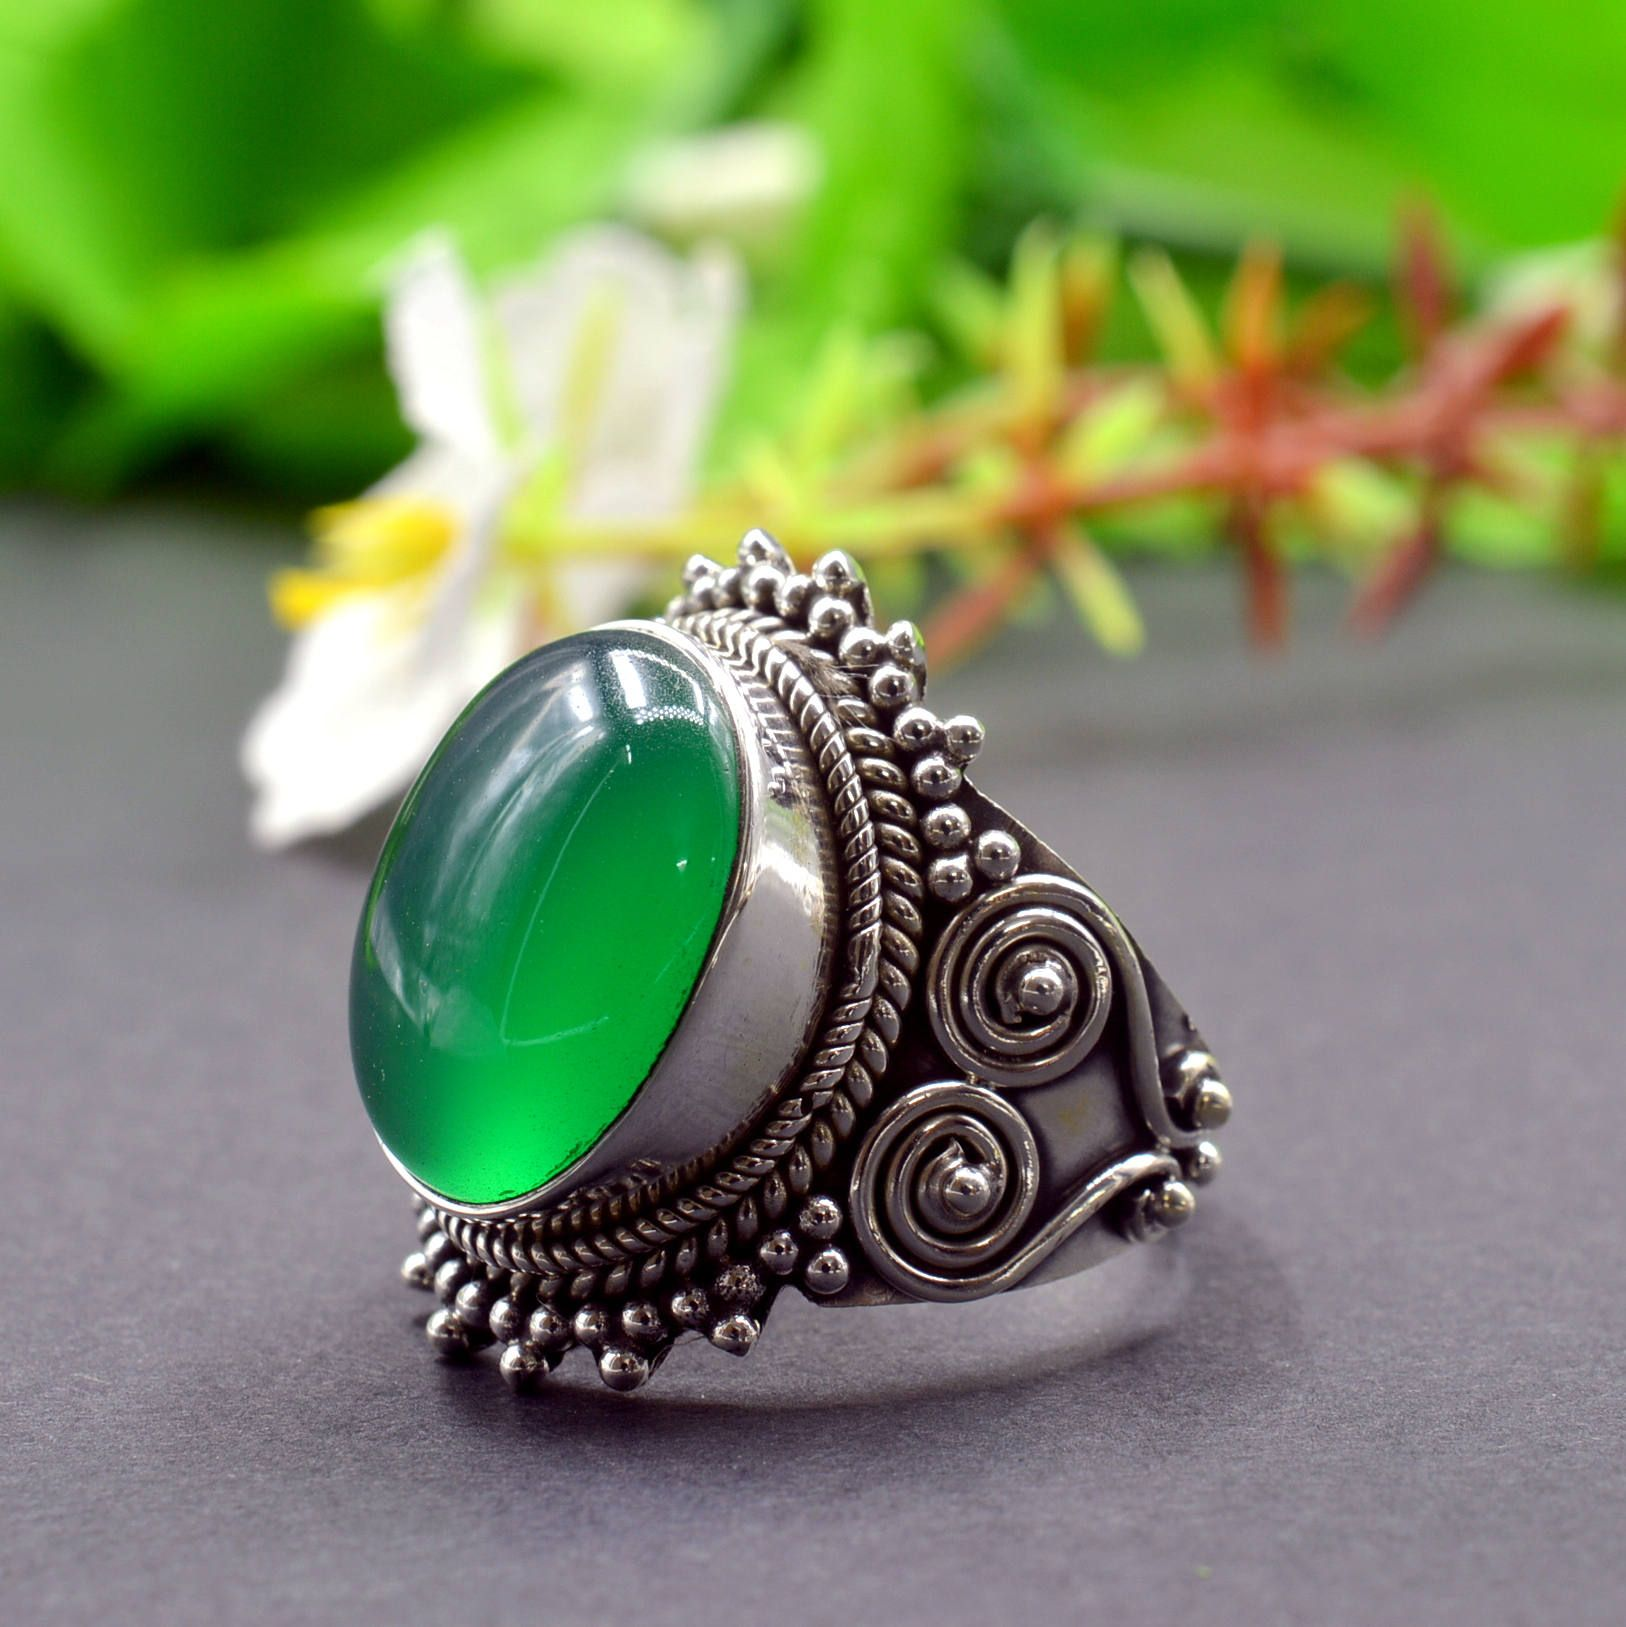 Handmade Ring,Statement Ring Birthstone Woman Ring Malachite Ring Size 8US Sterling Silver Ring Fashion Ring Statement Ring